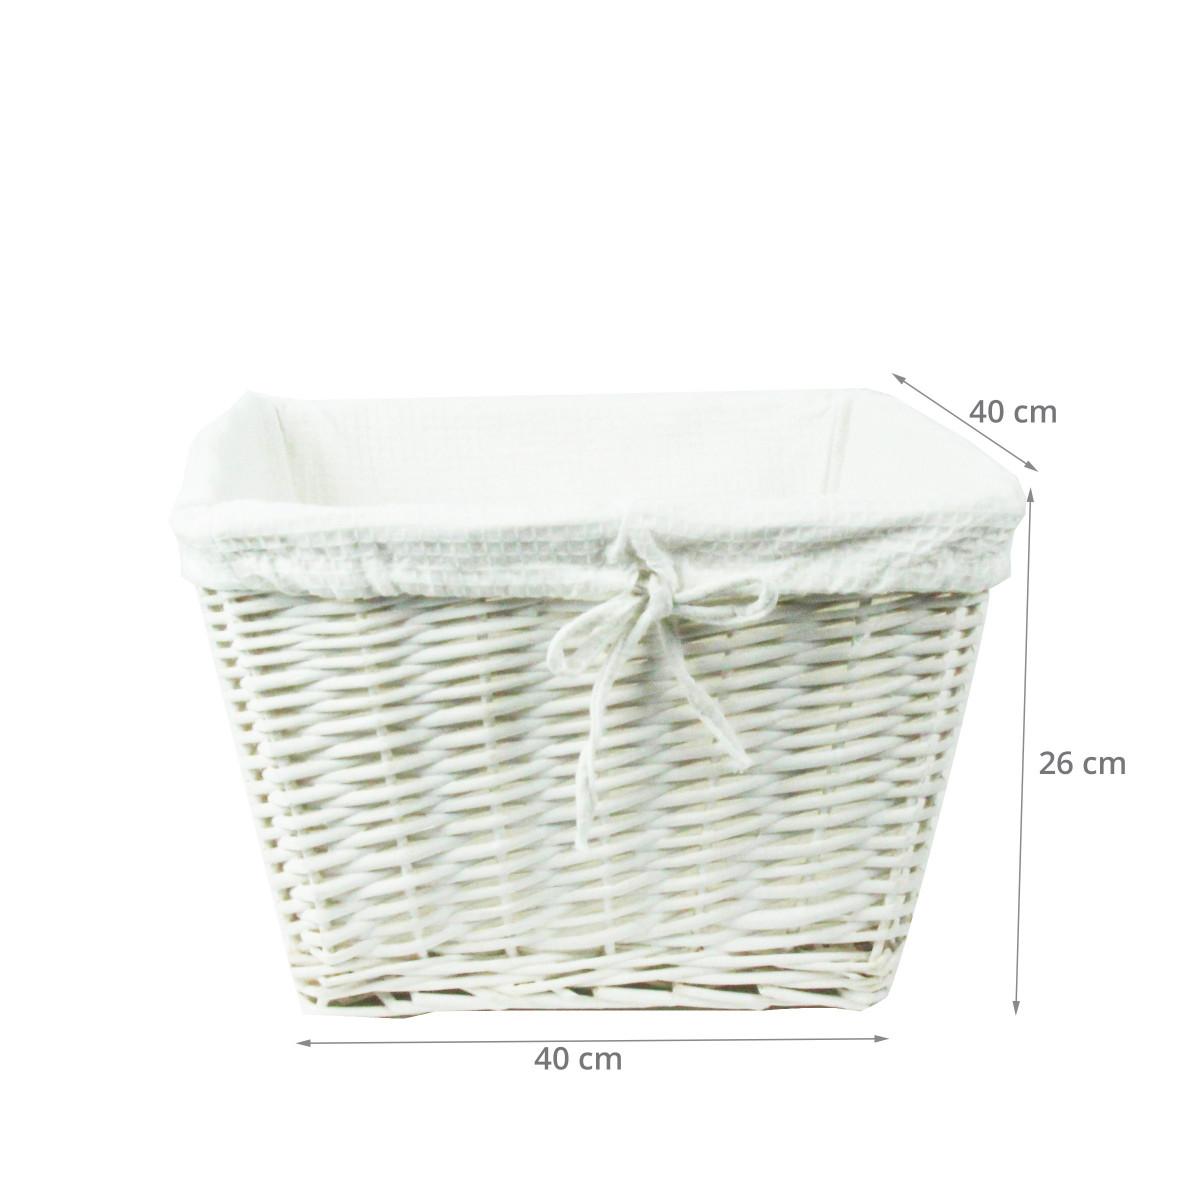 panier osier blanc avec housse tissu blanc rangement. Black Bedroom Furniture Sets. Home Design Ideas